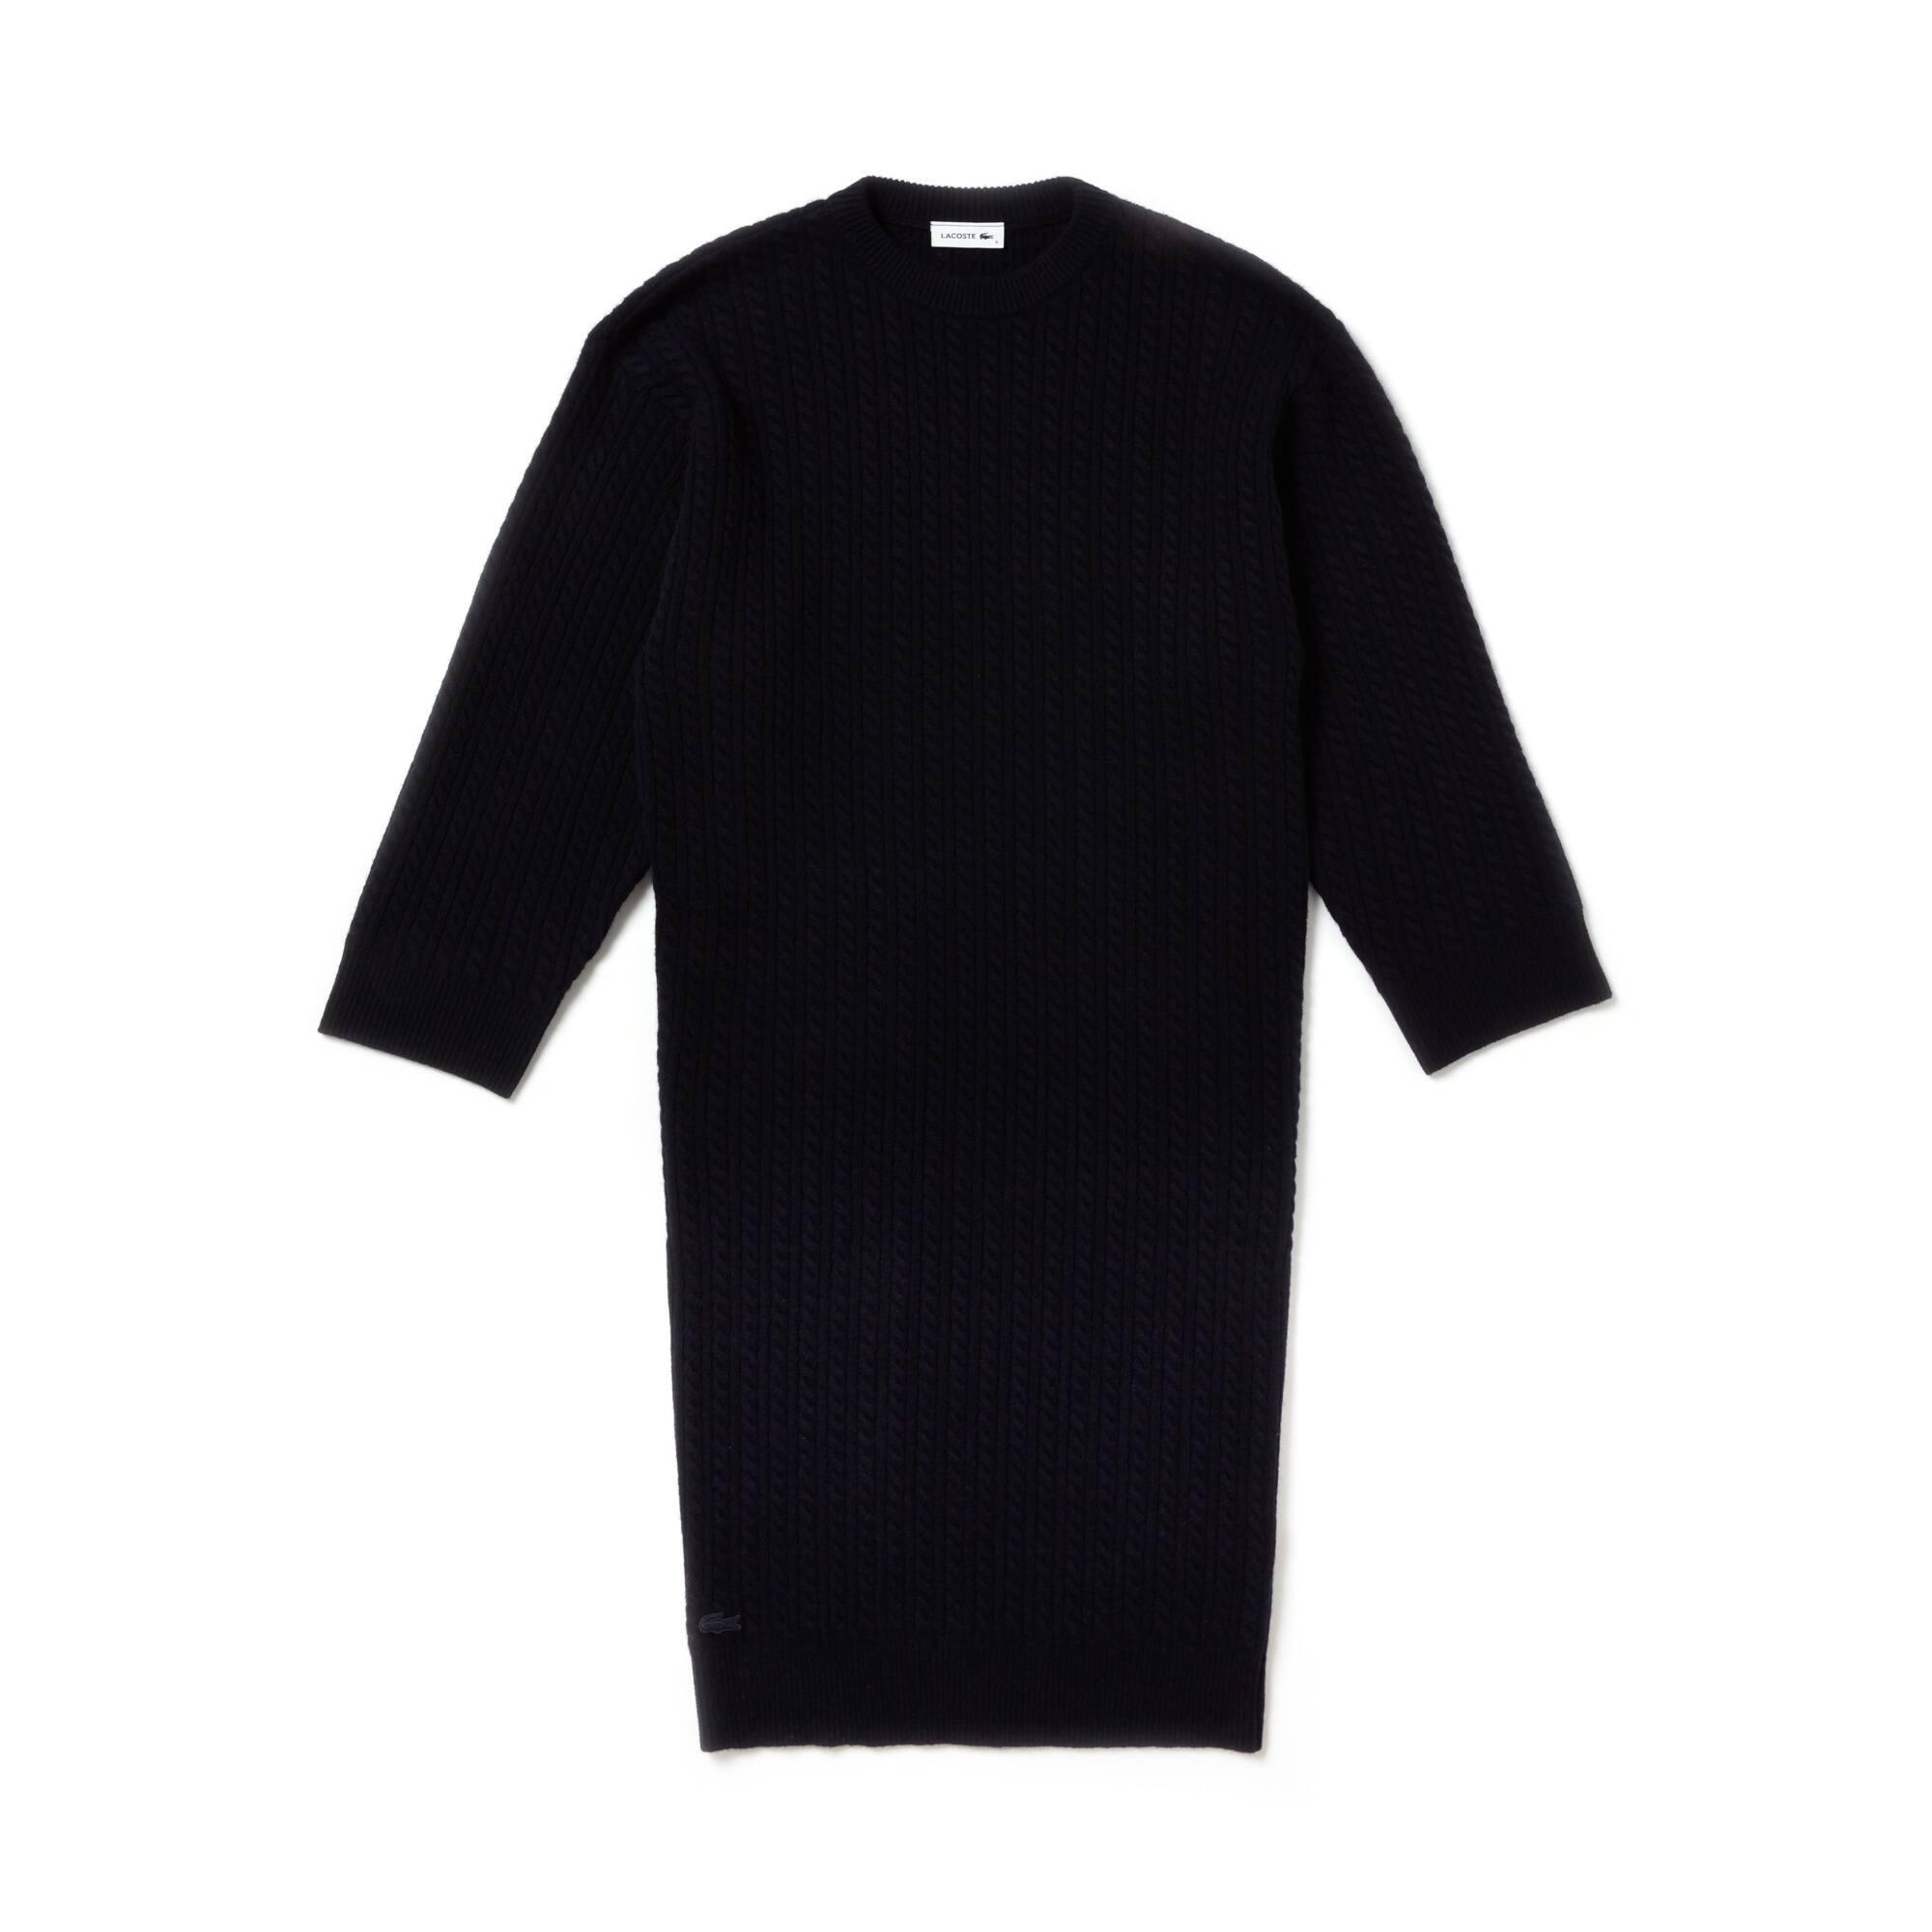 Vestido tipo sweater de caxemira e lã oversize do desfile para mulher